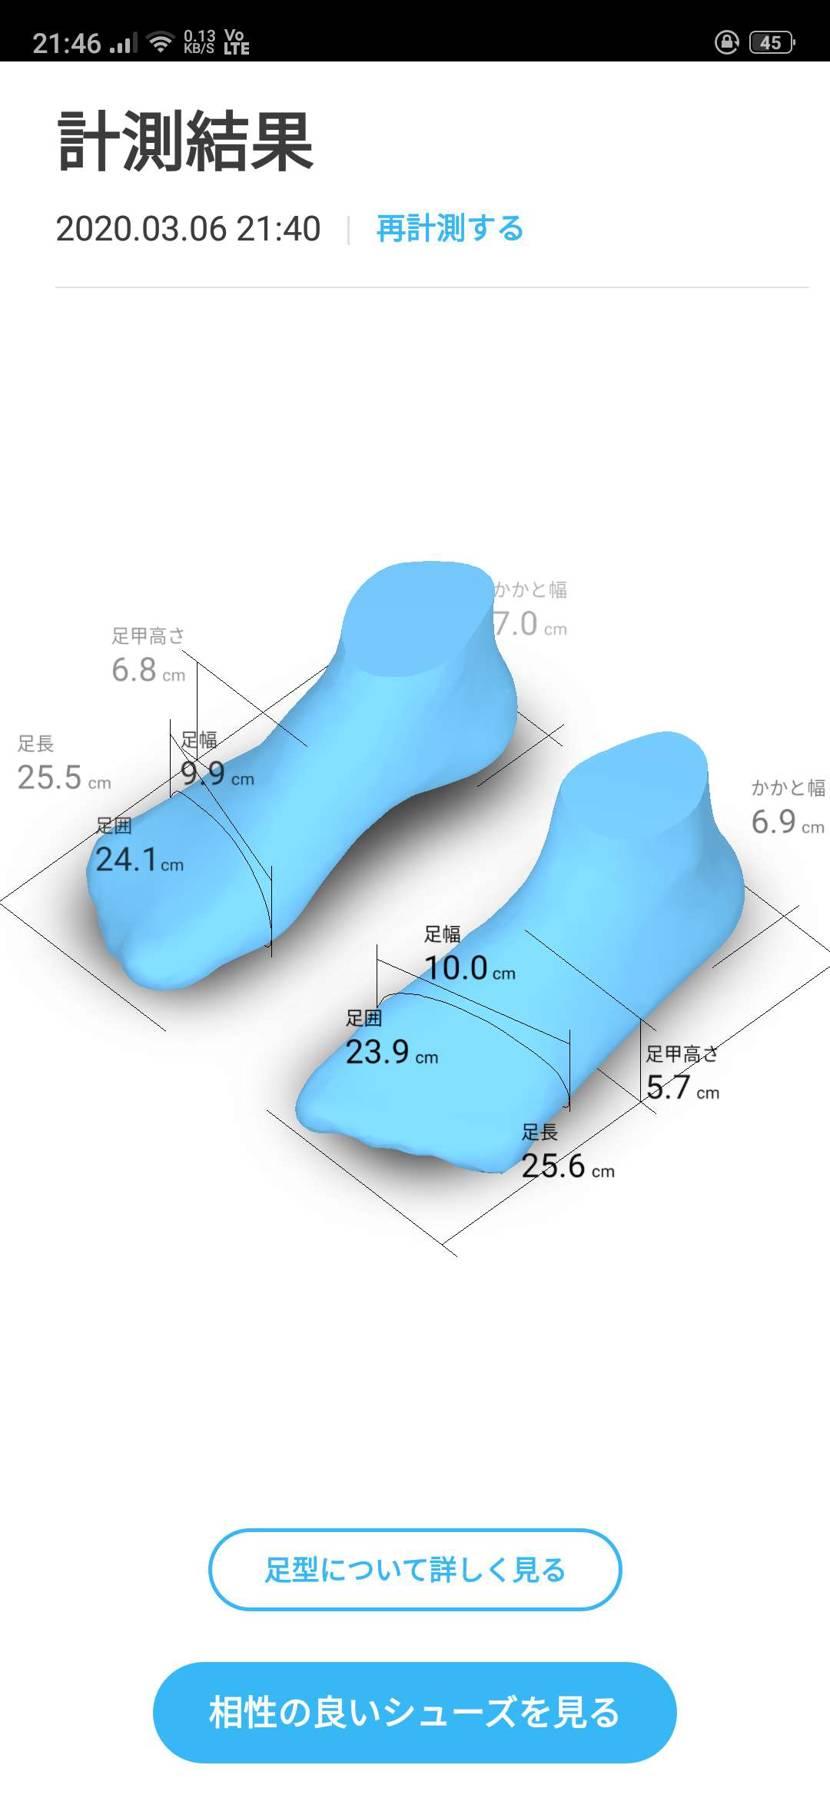 ZOZOMAT面白い🙂やっぱりasicsは日本人の足に合うのかな? ついでに1万